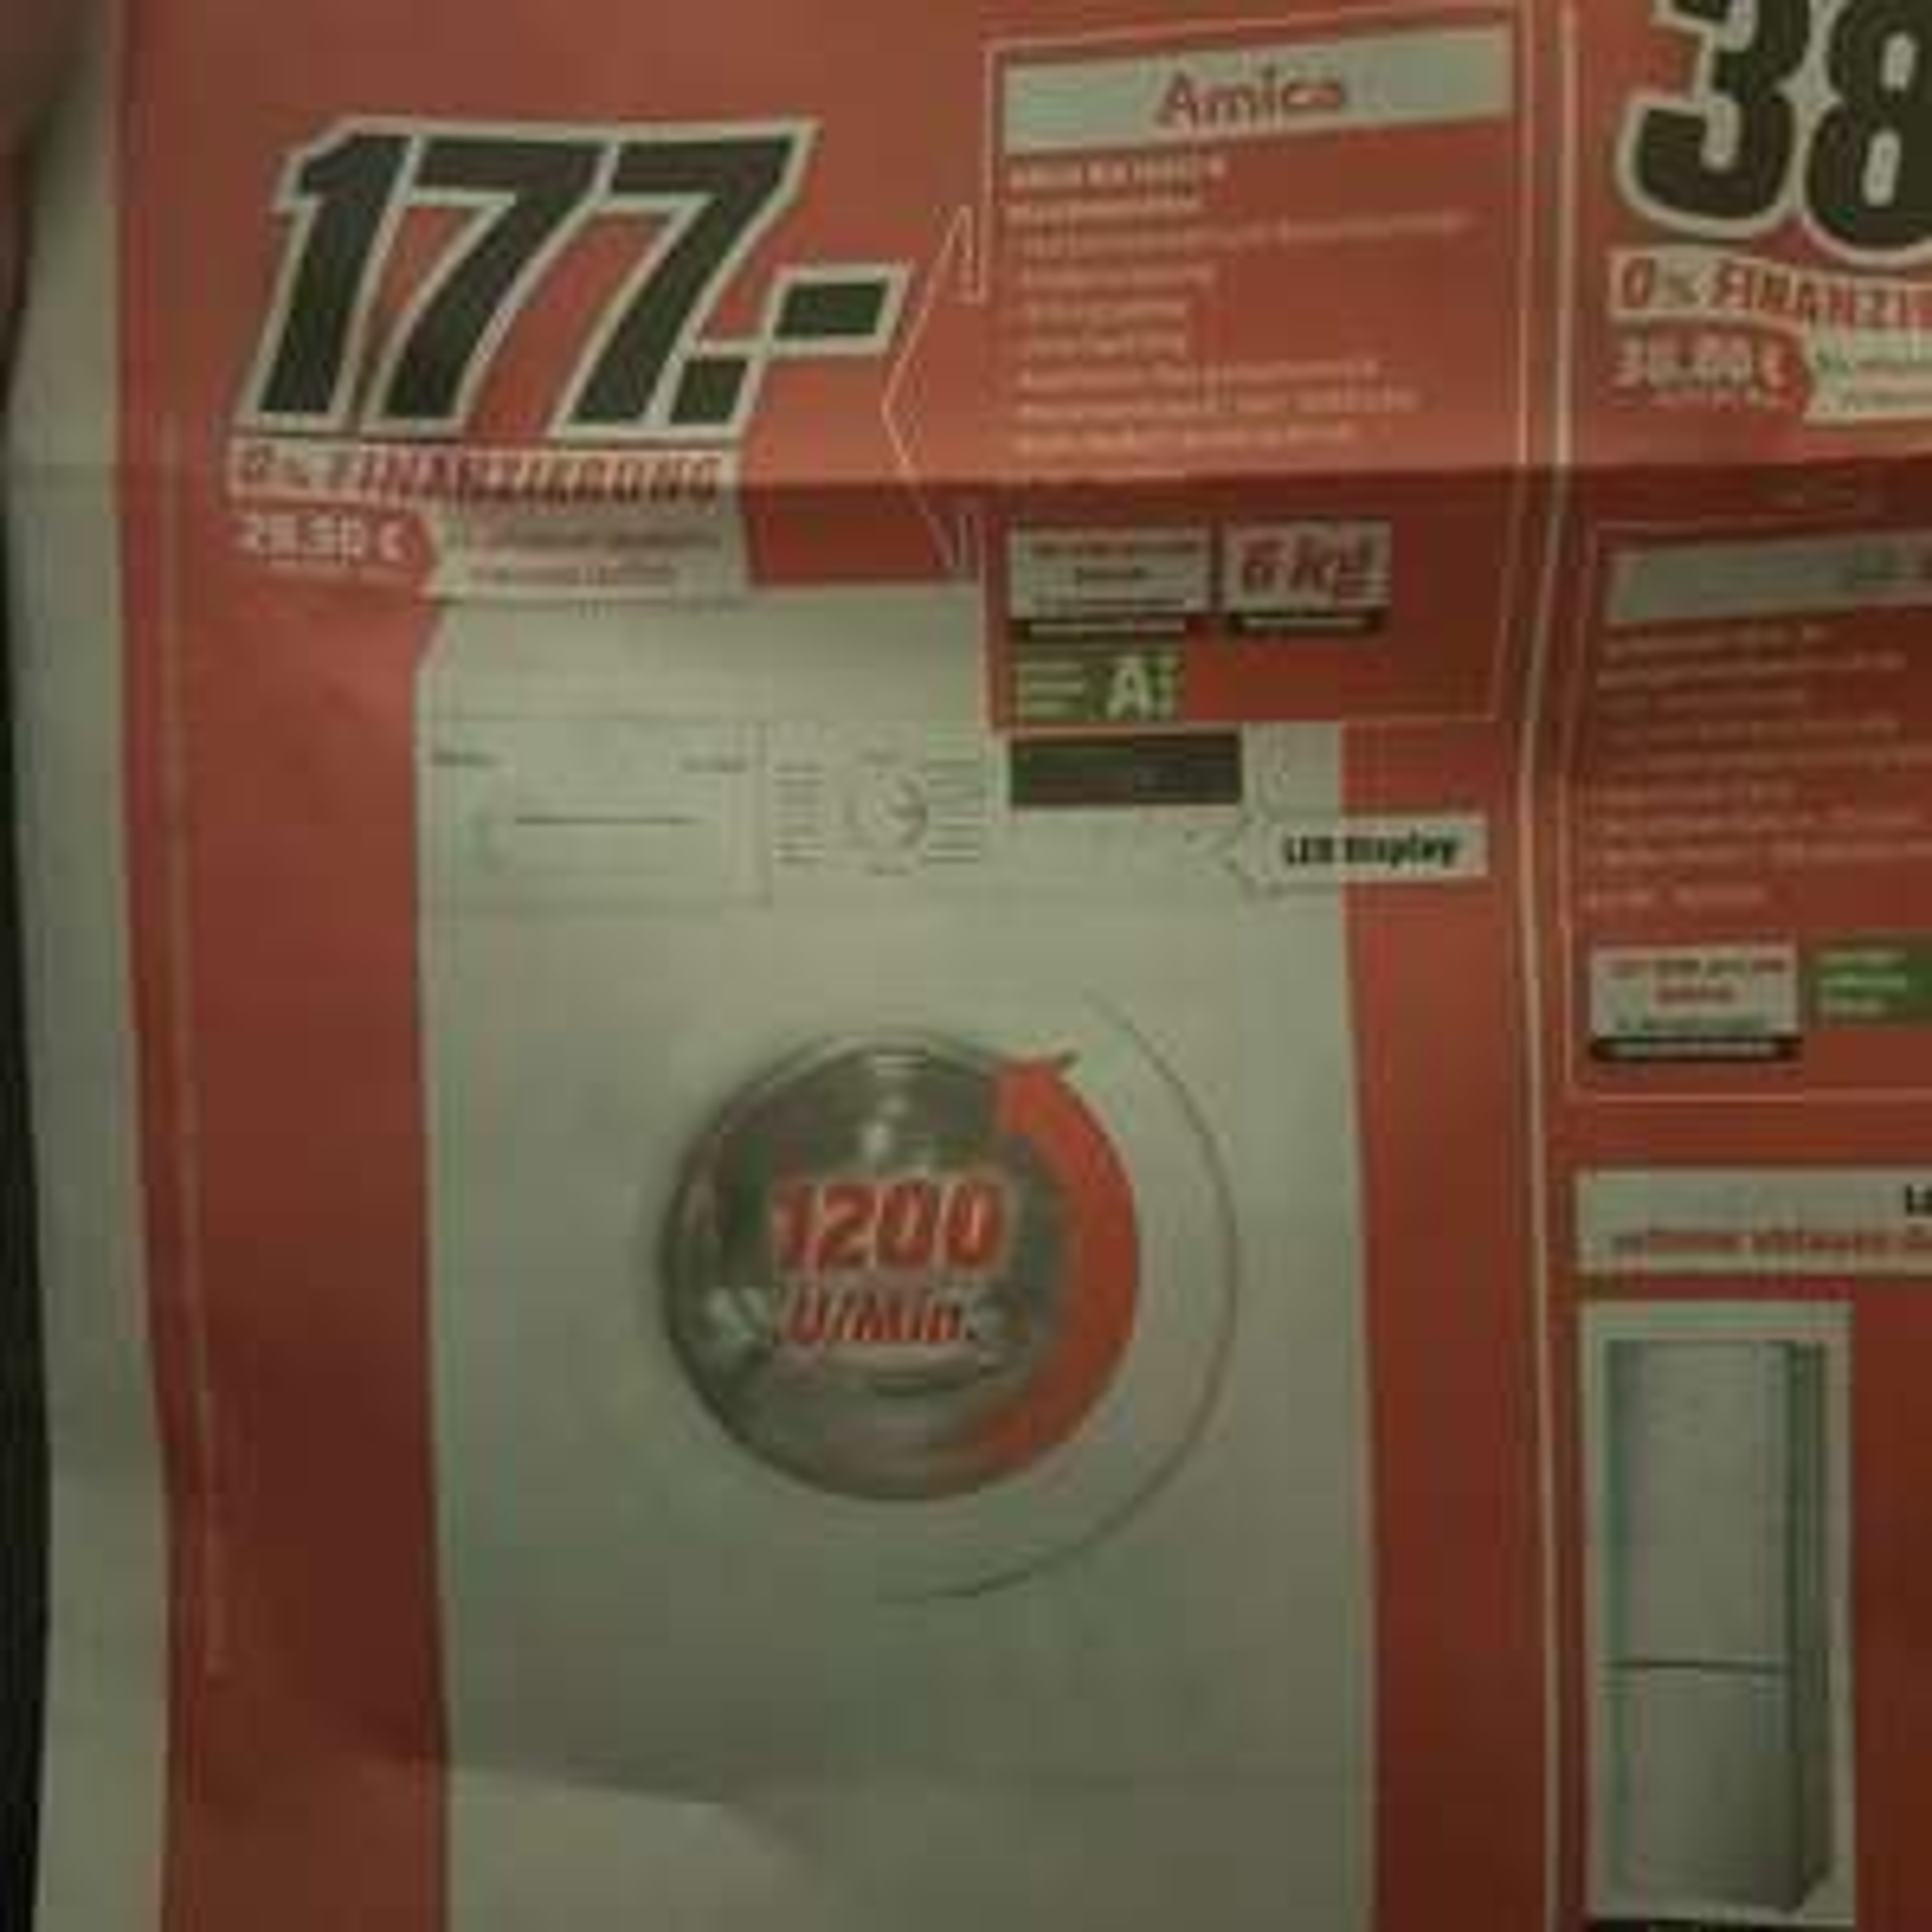 Waschmaschine Amica WA14653W lokal @ Mediamarkt Berlin